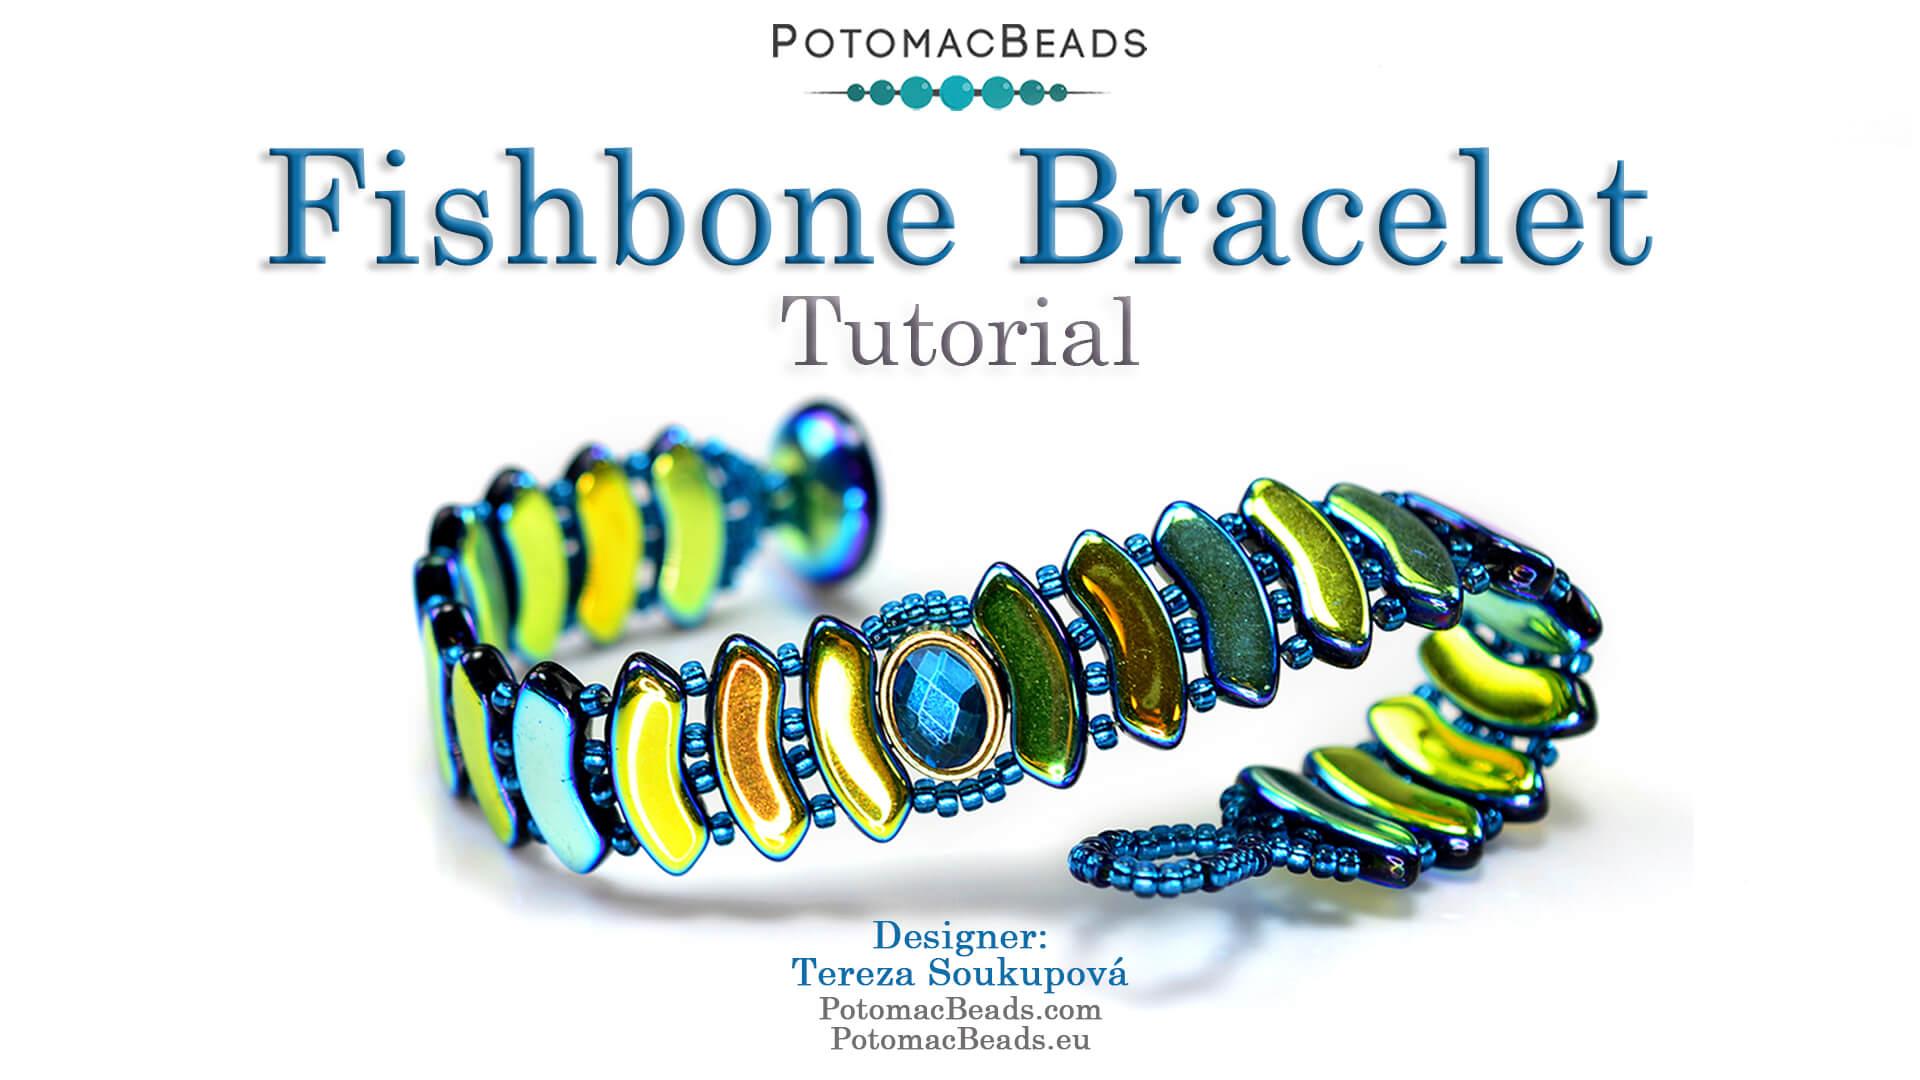 How to Bead Jewelry / Videos Sorted by Beads / QuadBow & PieDuo Bead Videos / Fishbone Bracelet Tutorial